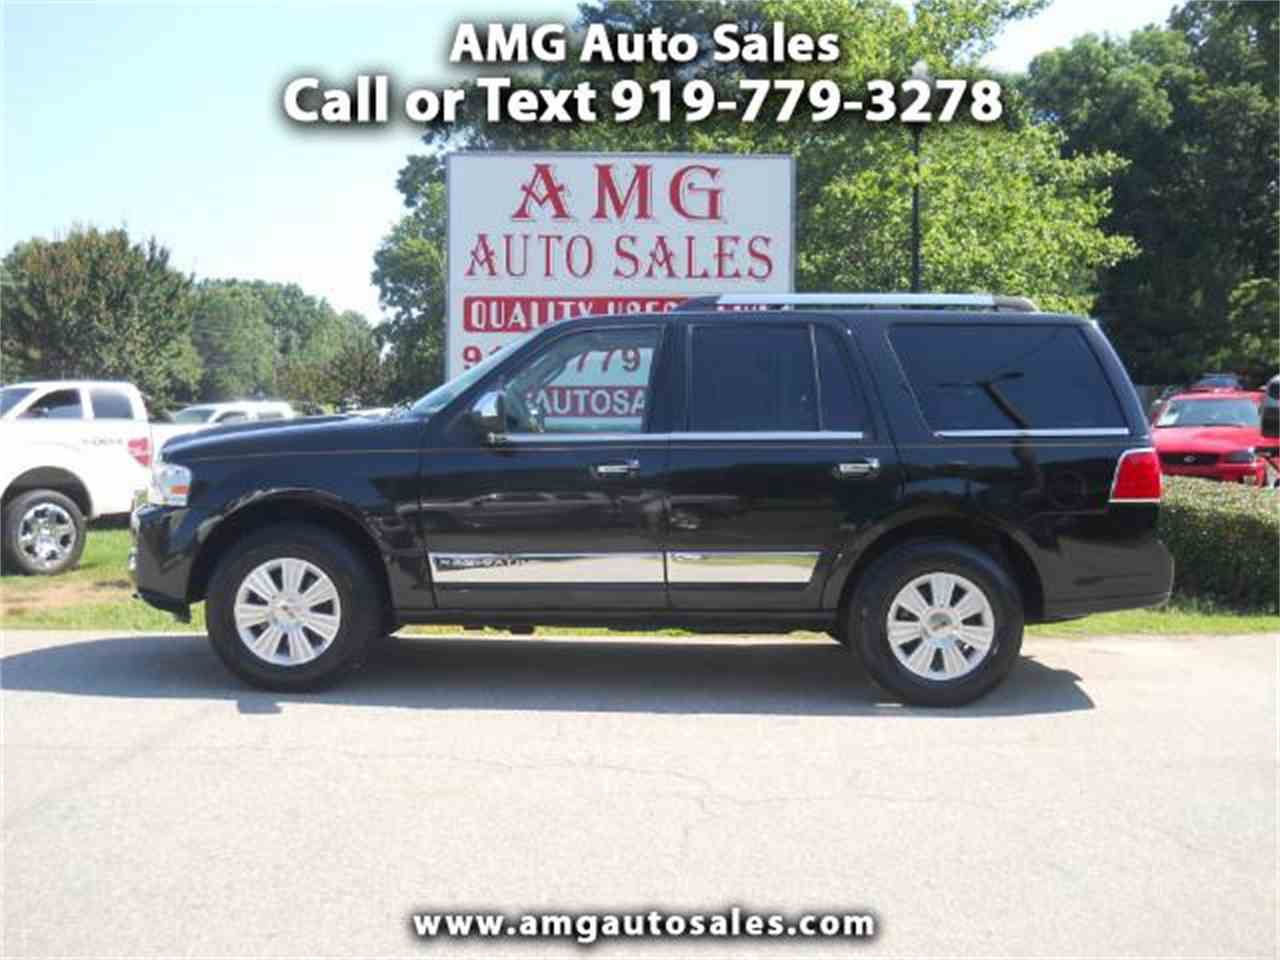 for sale texas l lincoln limos austin navigator limo large lexani used motorcars suv